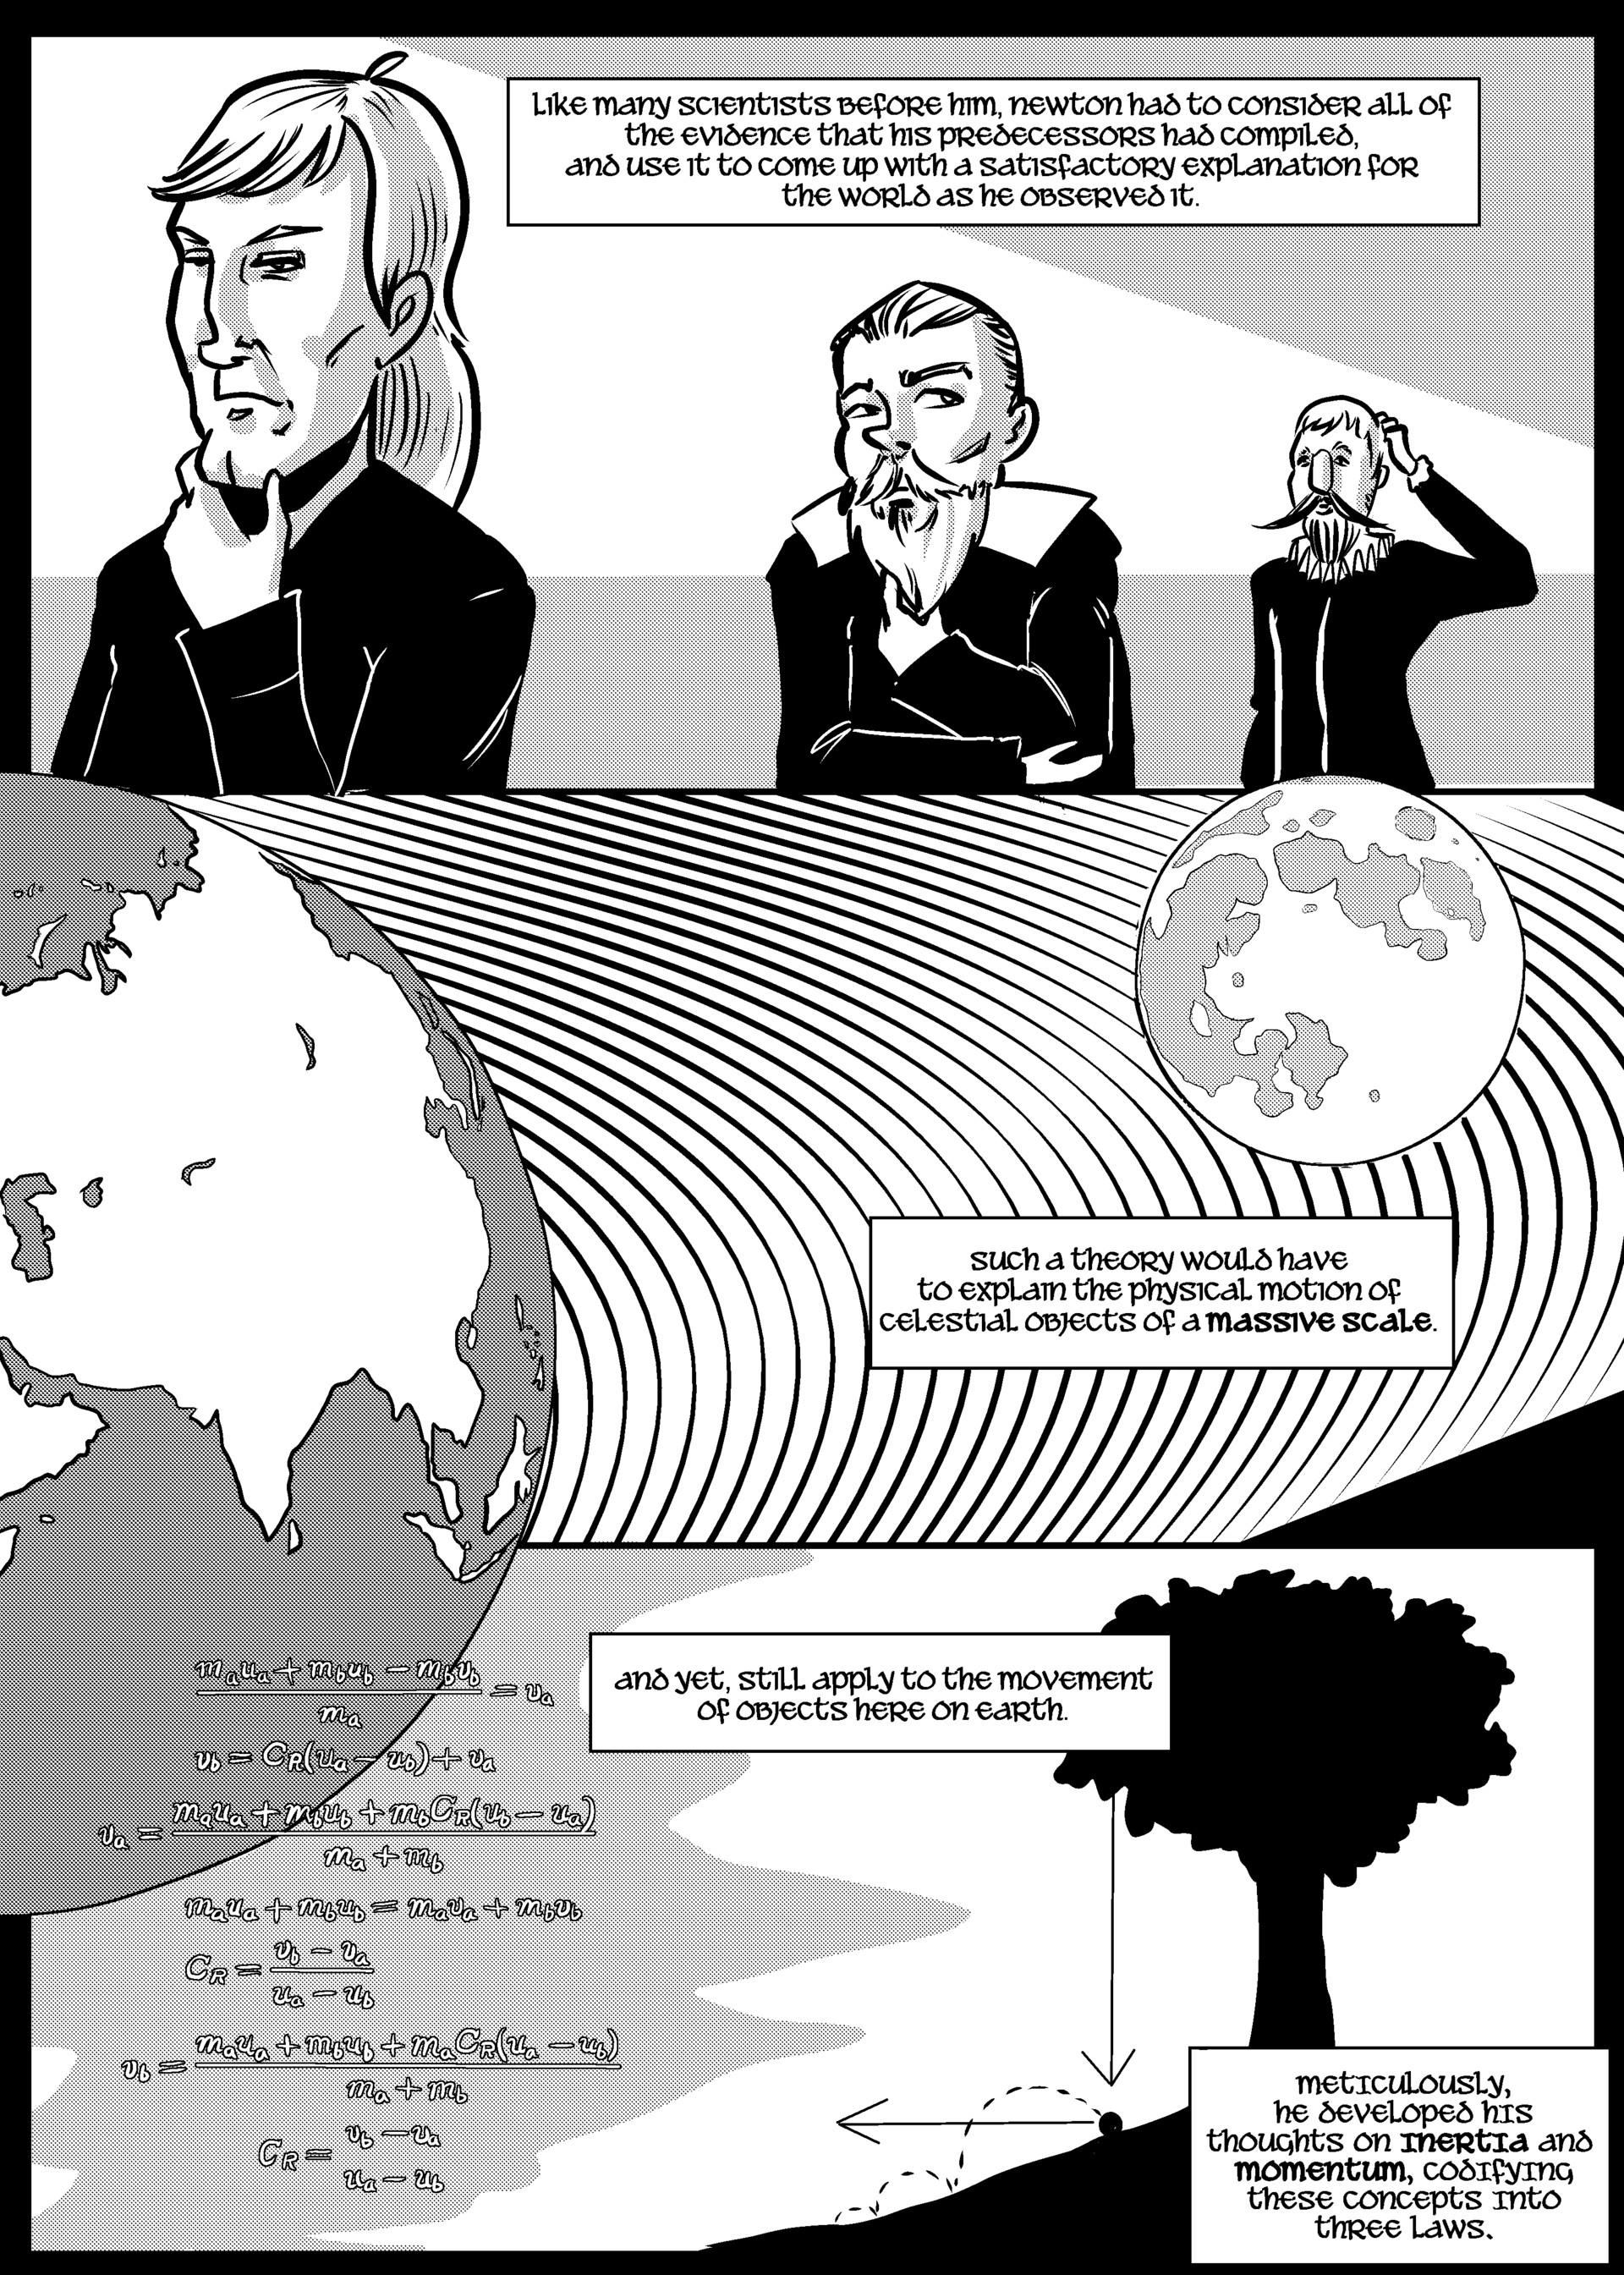 Michael davis heroes of the scientific revolution 008